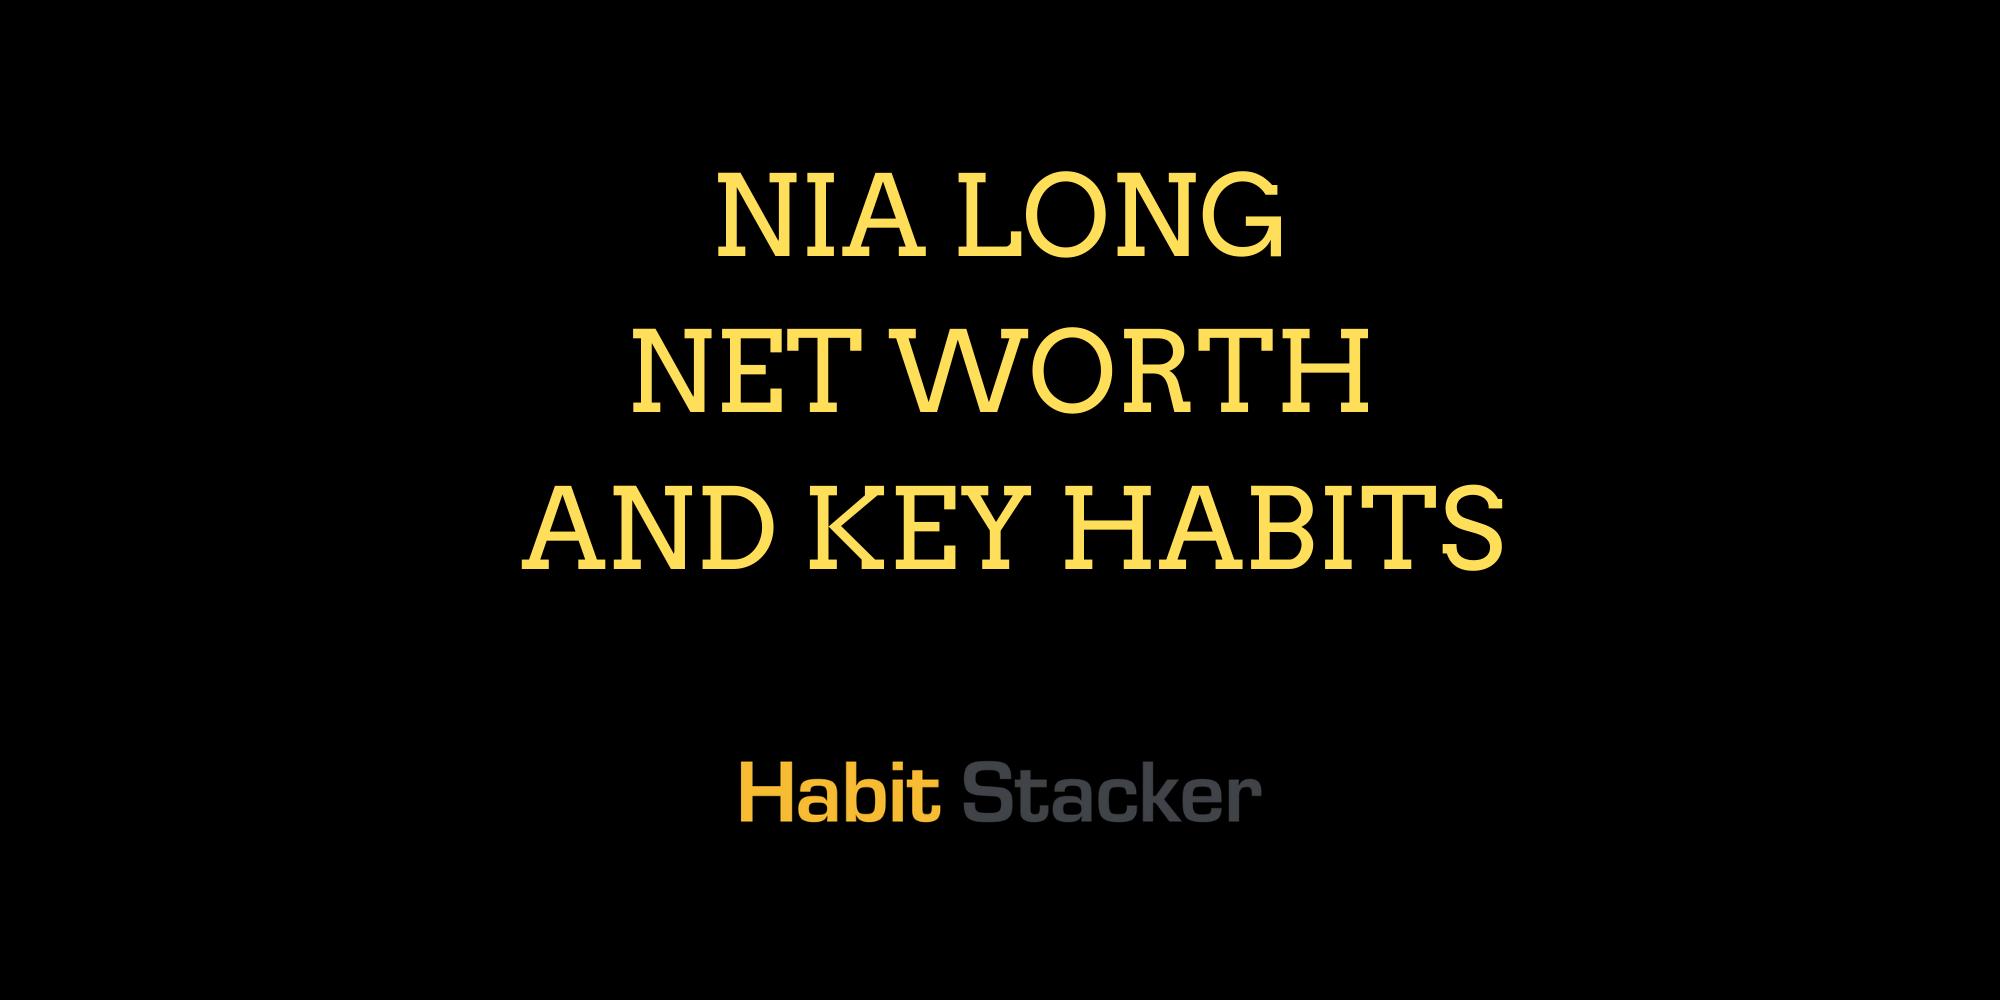 Nia Long Net Worth and Key Habits